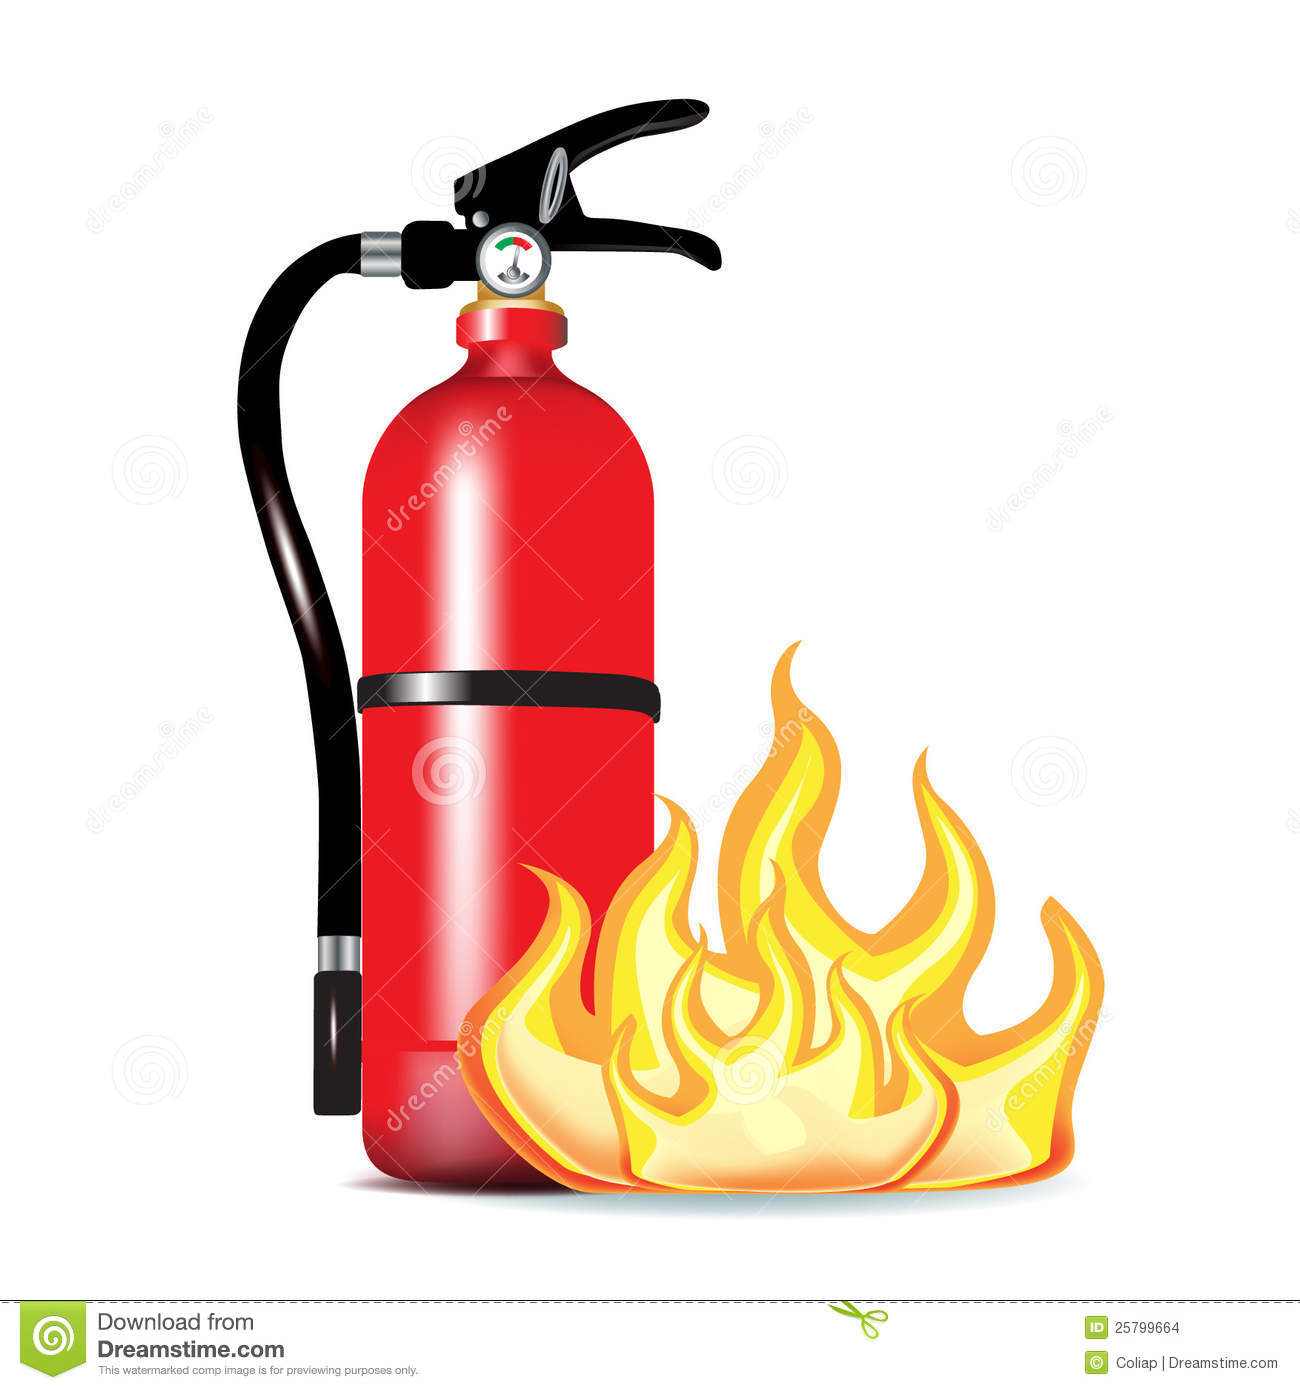 Clipart. Fire Extinguisher .-Clipart. Fire extinguisher .-4